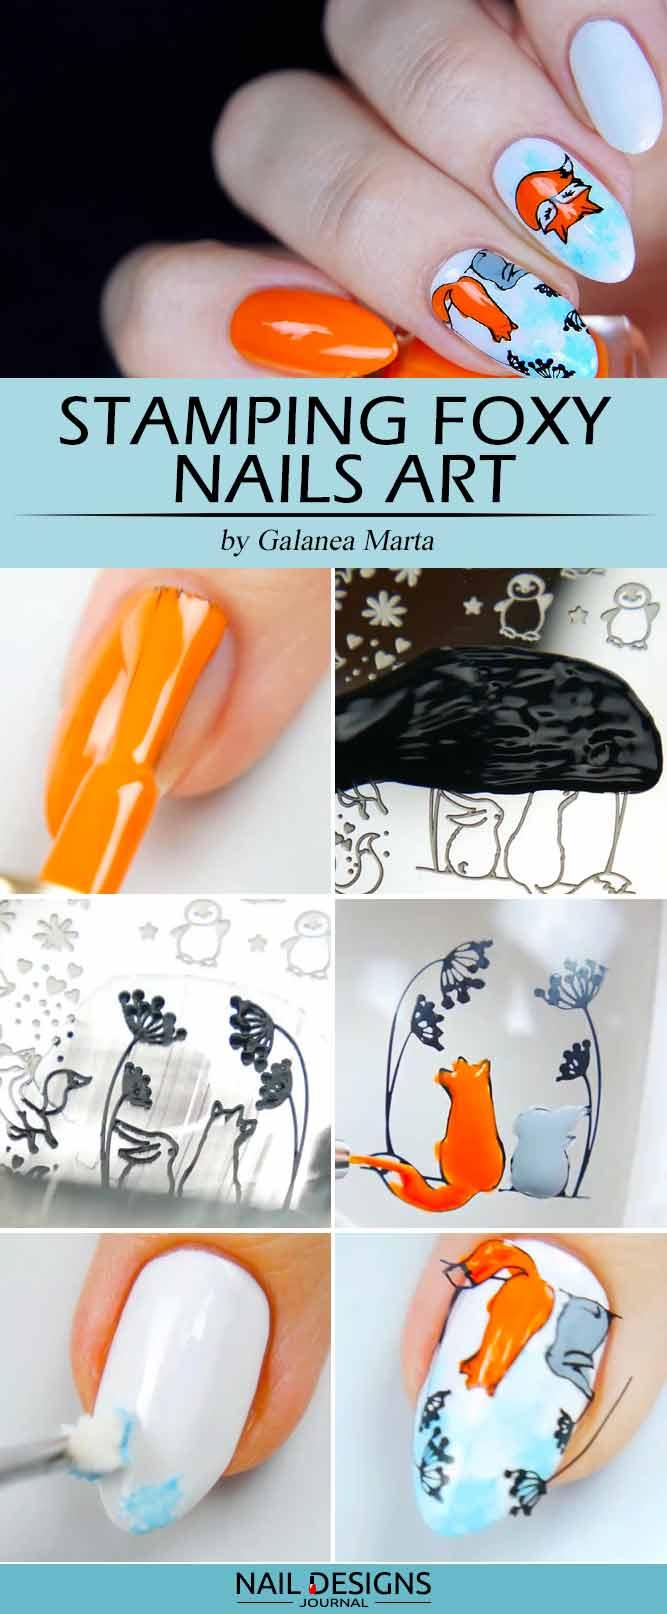 Stamping Foxy Nails Art